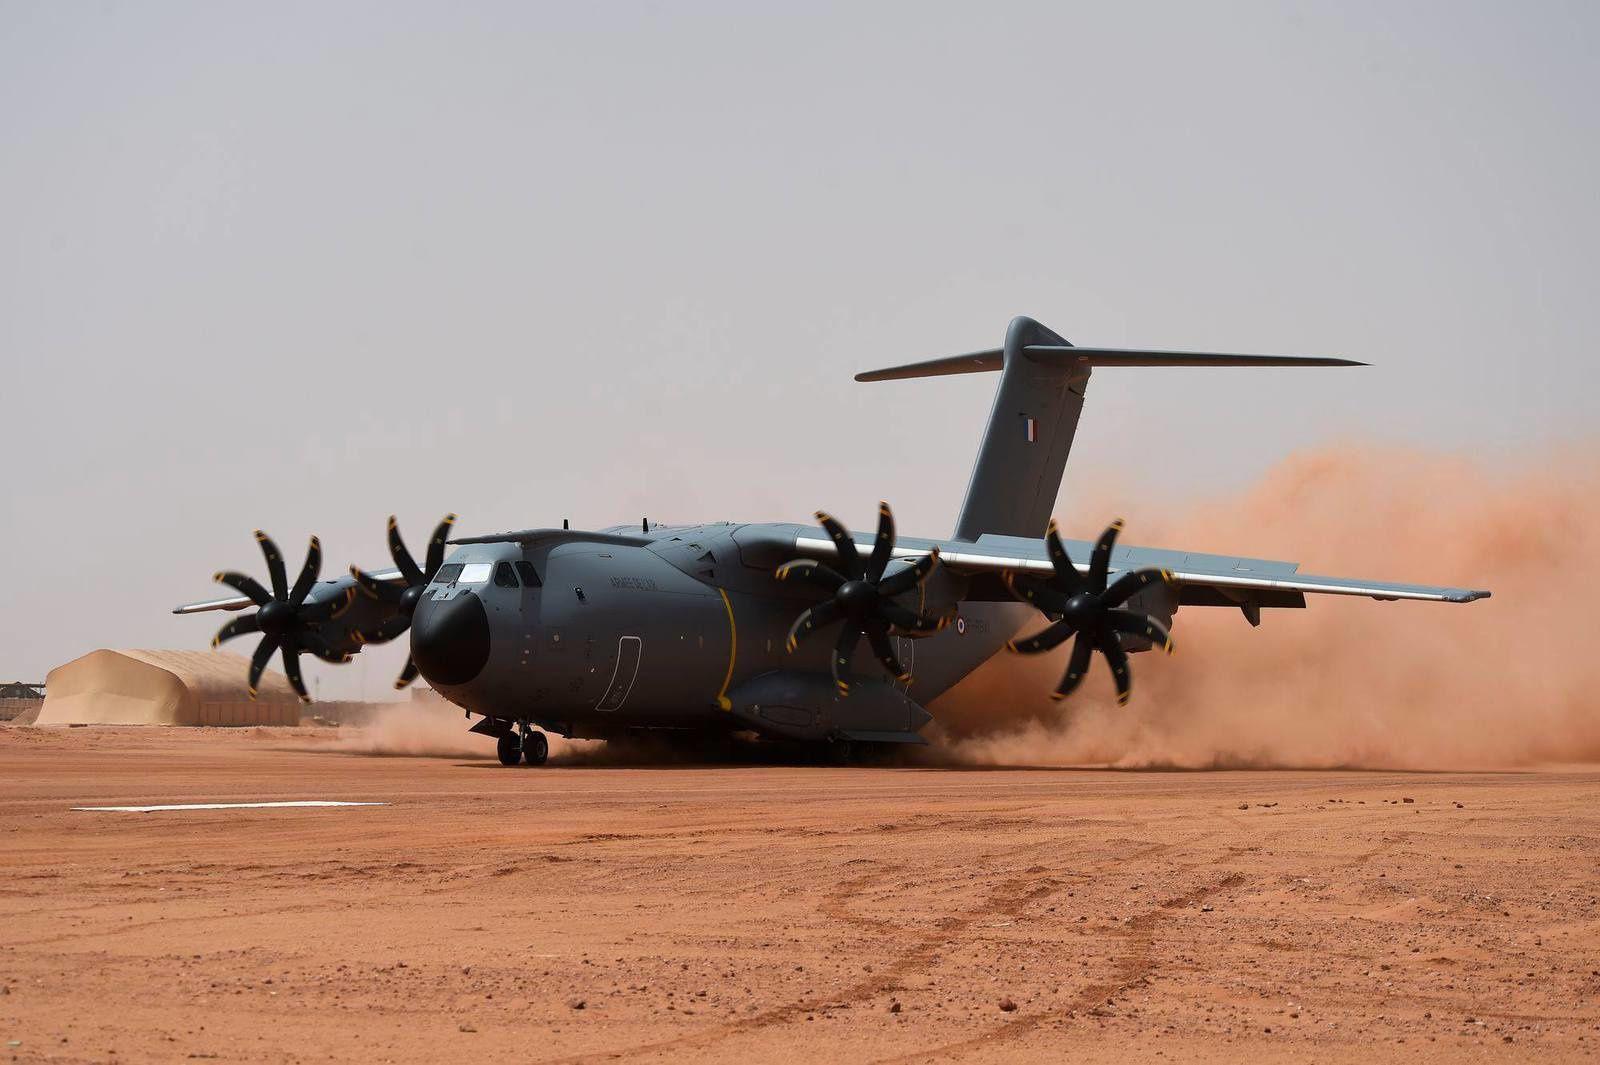 Un A400M de l'Armée de l'Air se pose sur le base avancée de Madama, au Niger